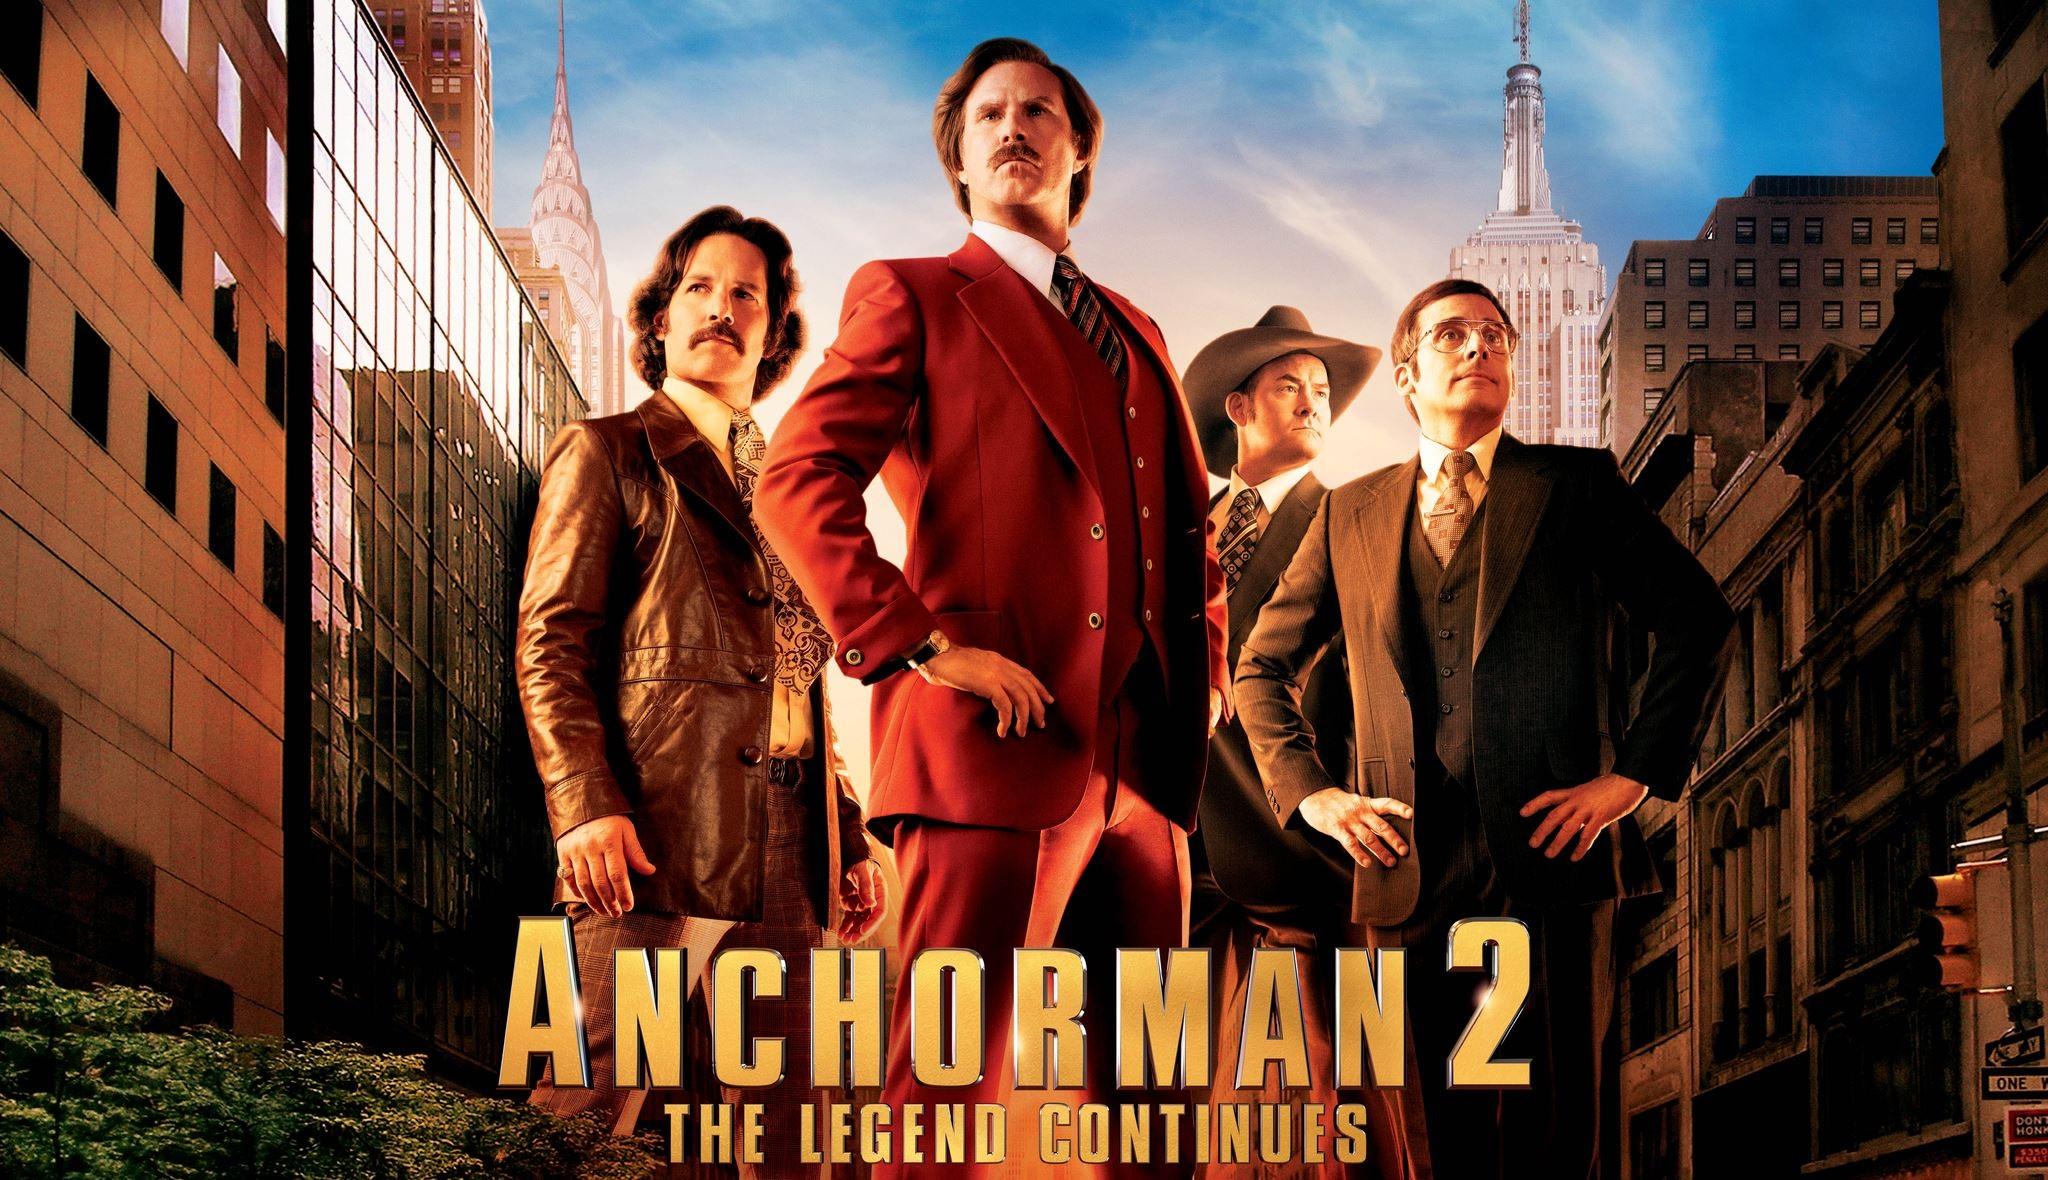 Anchorman 2: The Legend Continues (2013) - IMDb